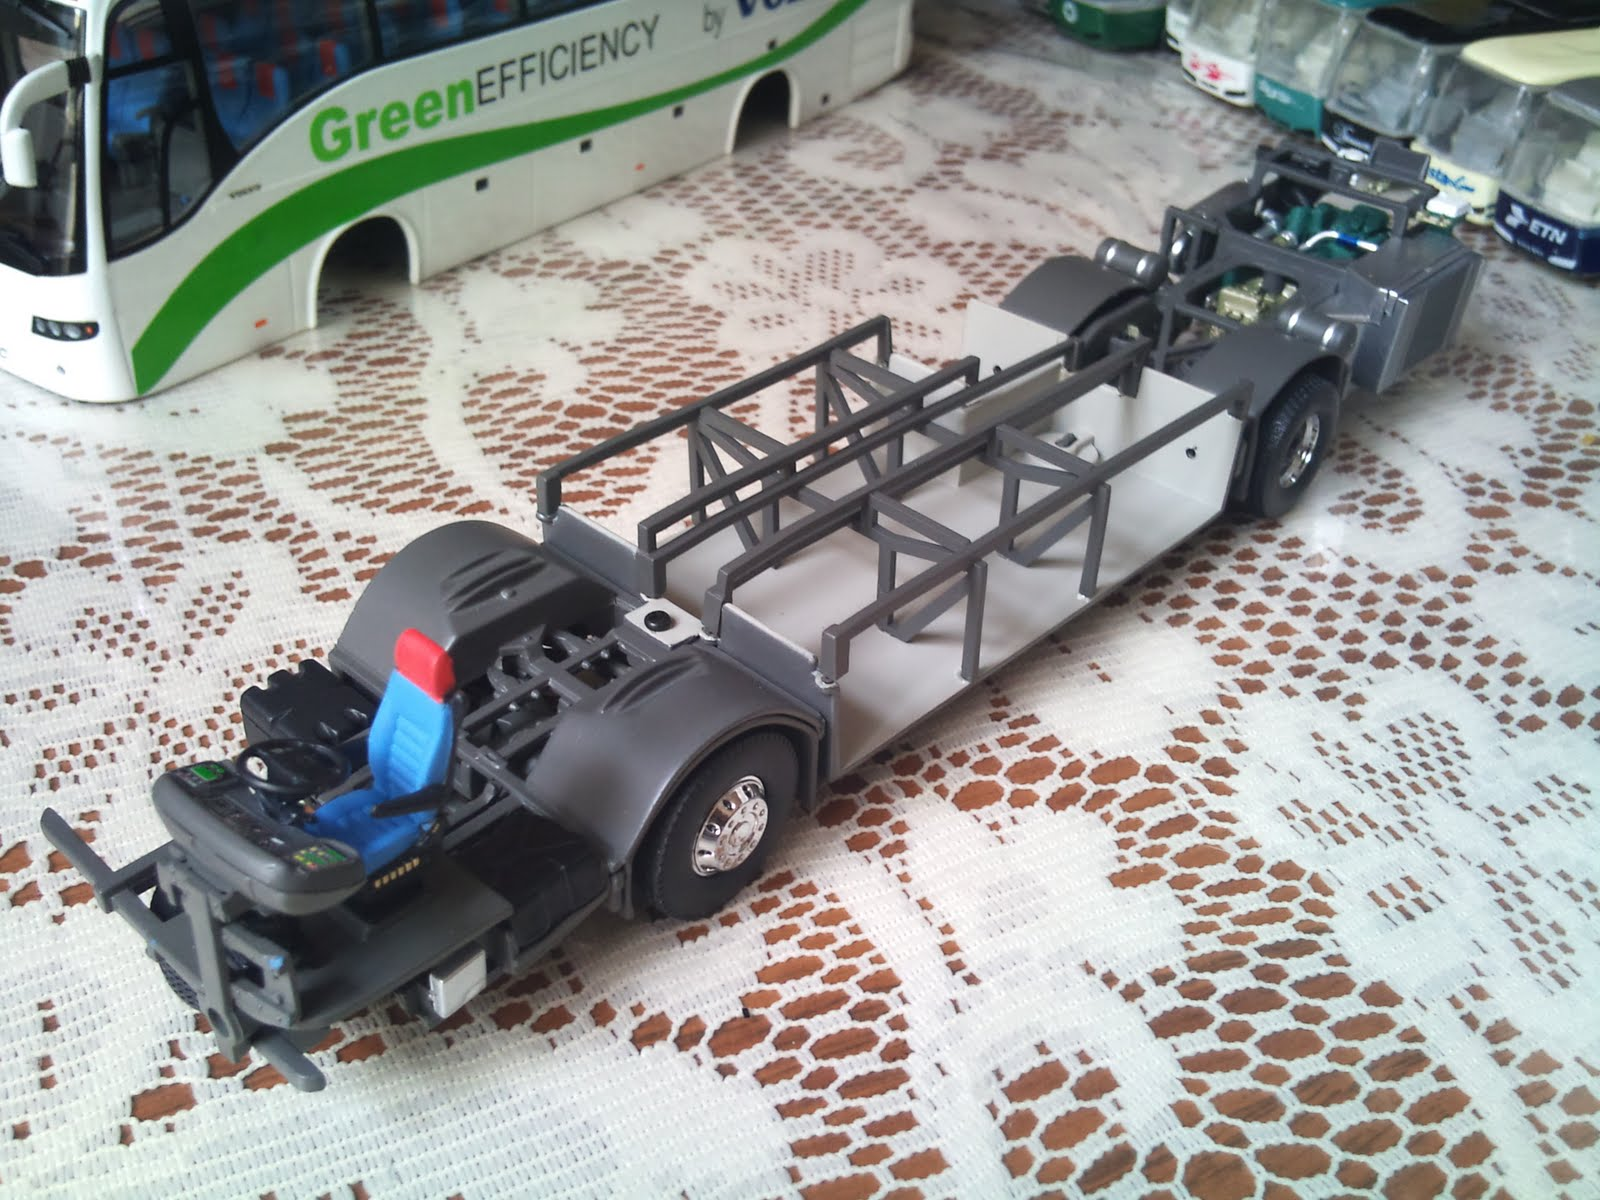 Movilbus autobuses a escala for Hacer planos a escala